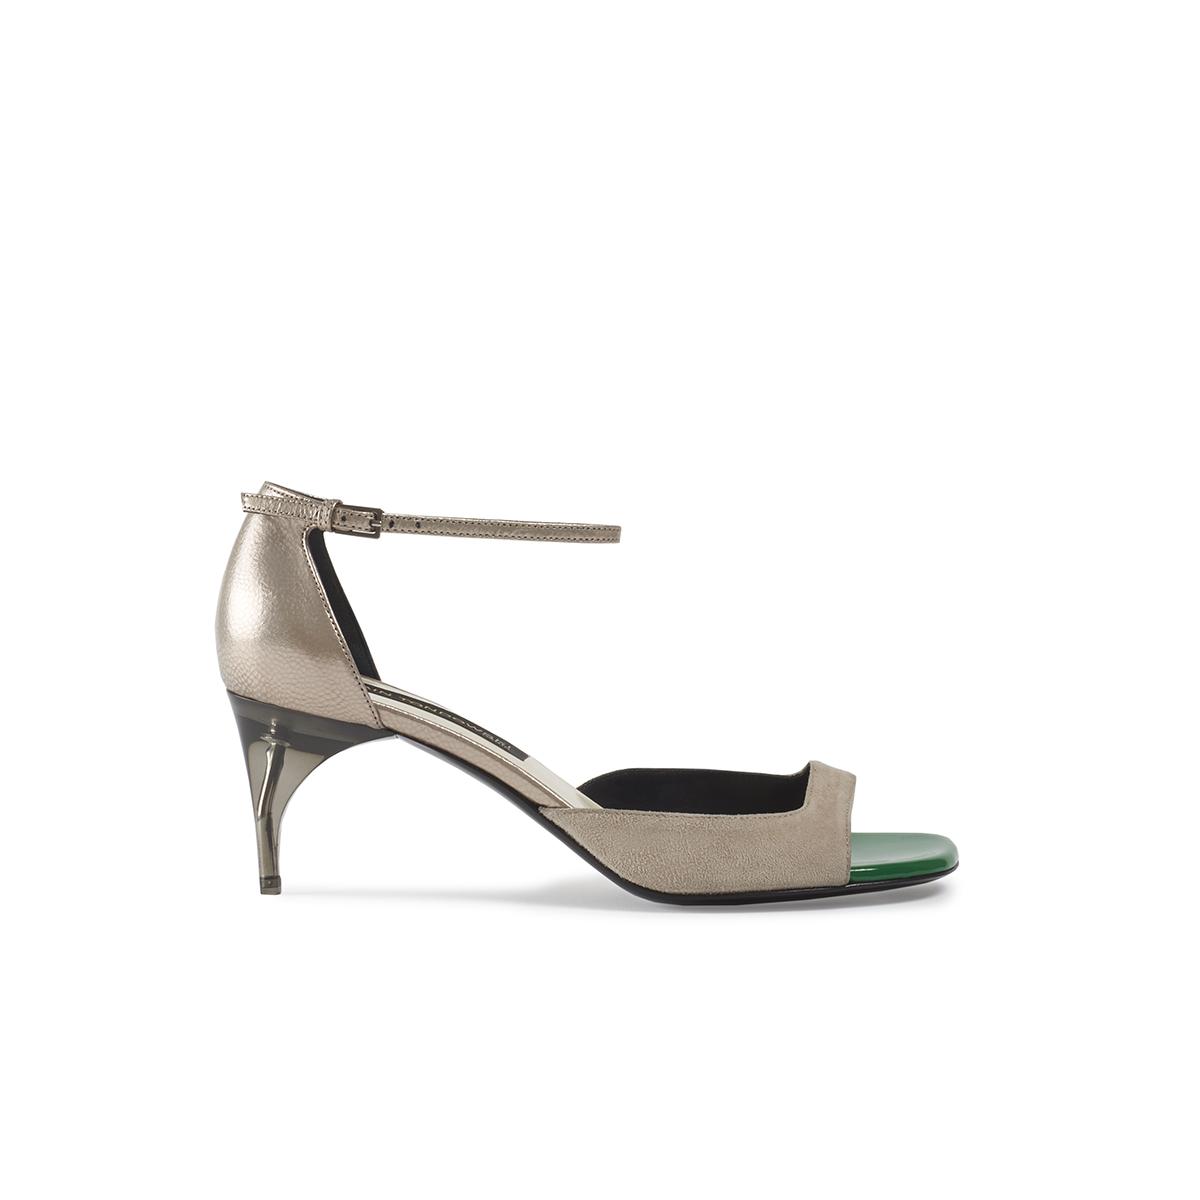 012_alaintondowski_springsummer2017_shoes_3050-153-contr